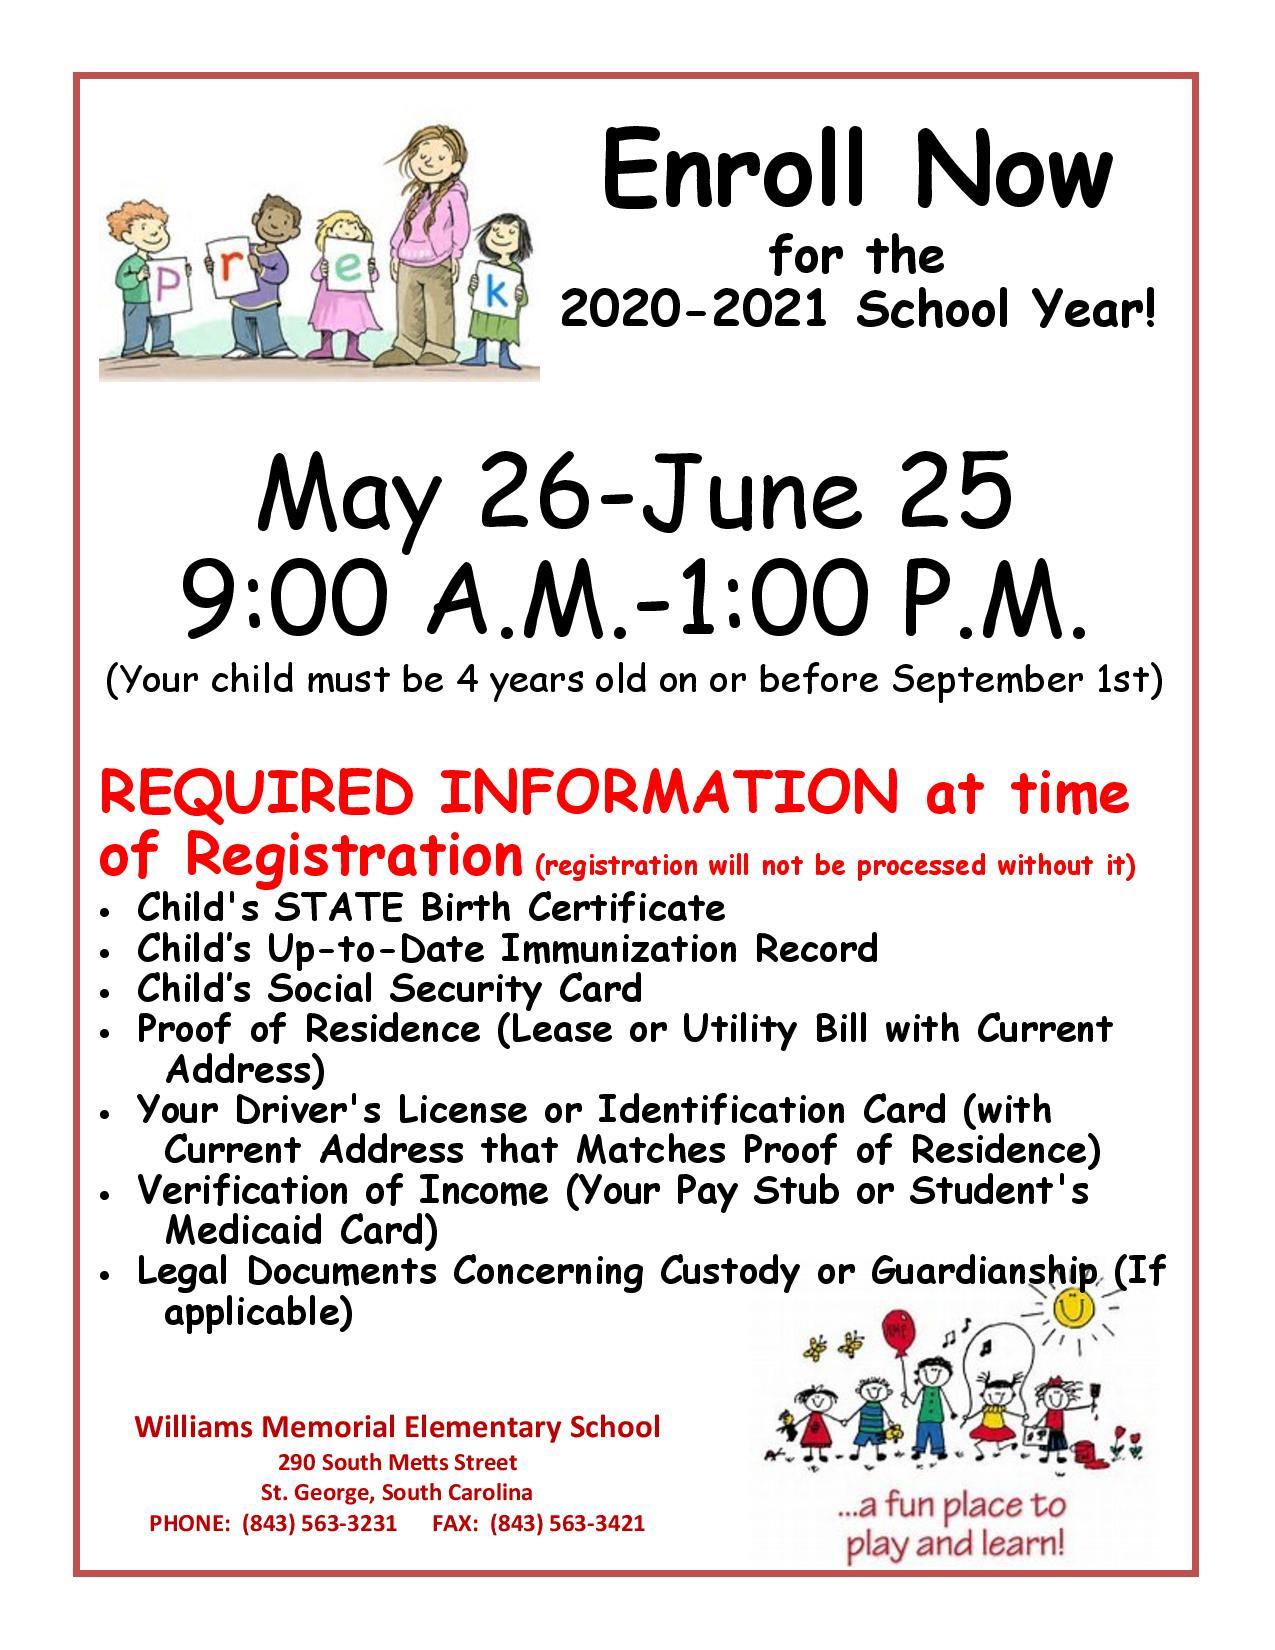 Home - Williams Memorial Elementary School Regarding Dorchester County School Calendar 2021 2020